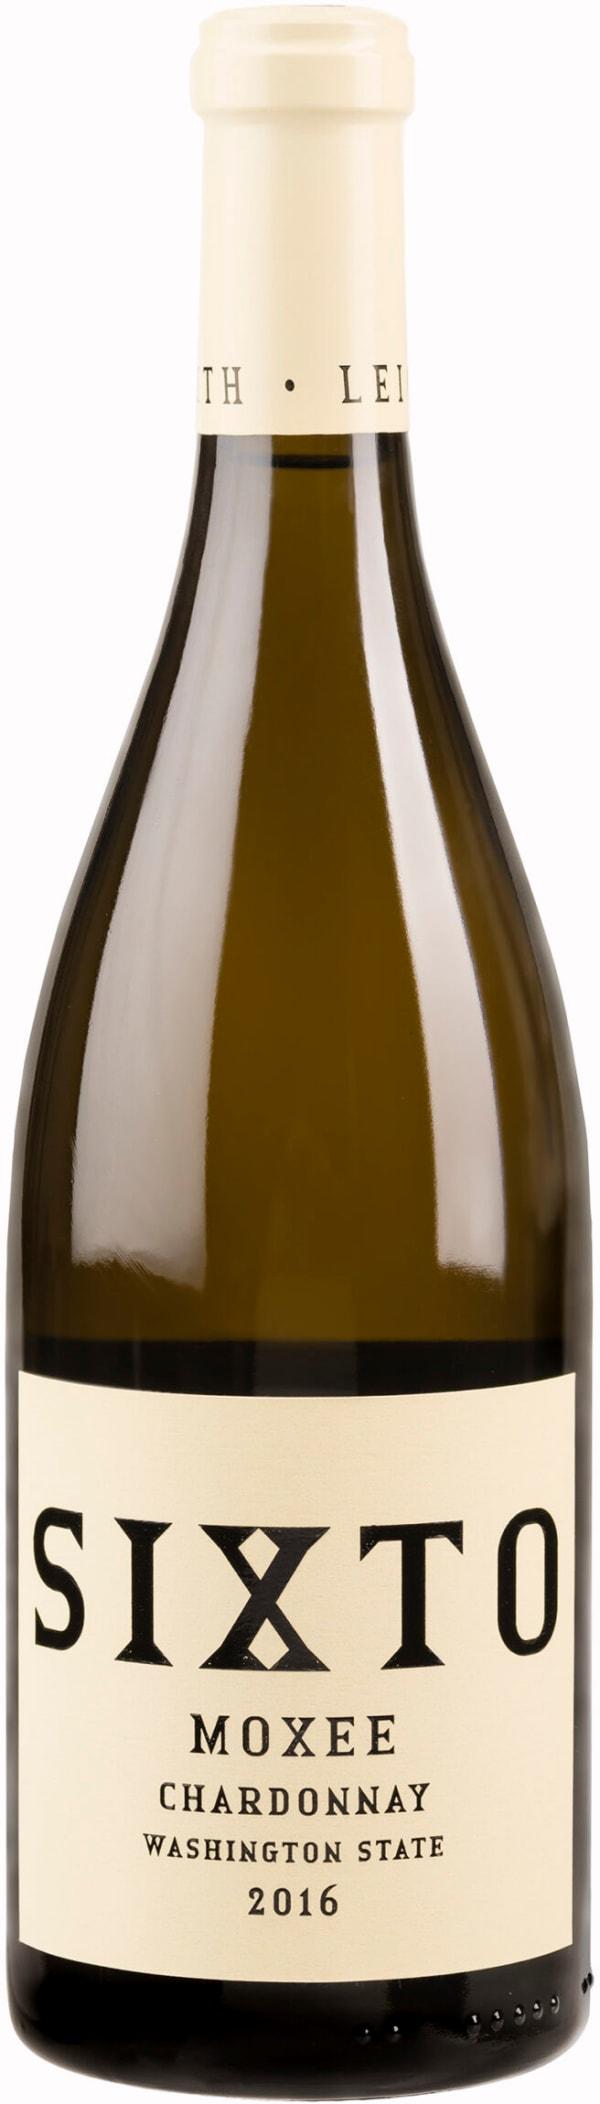 Sixto Moxee Chardonnay Magnum 2016